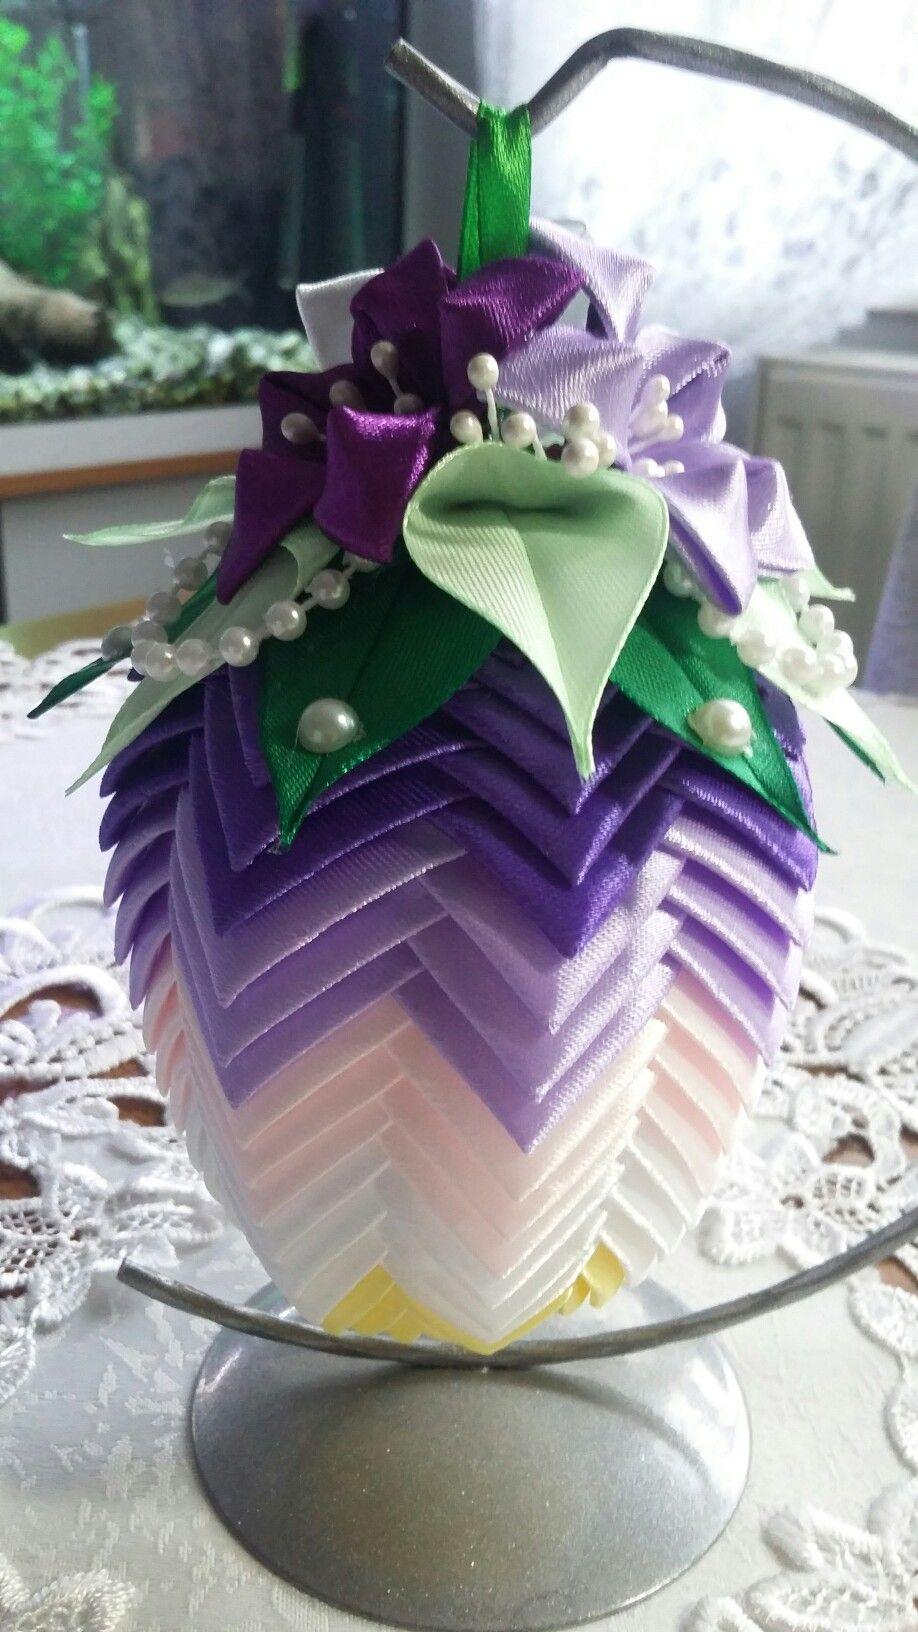 Jajko Wielkanocne Uovo Di Pasqa Origami Christmas Ornament Christmas Origami Diy Christmas Ornaments